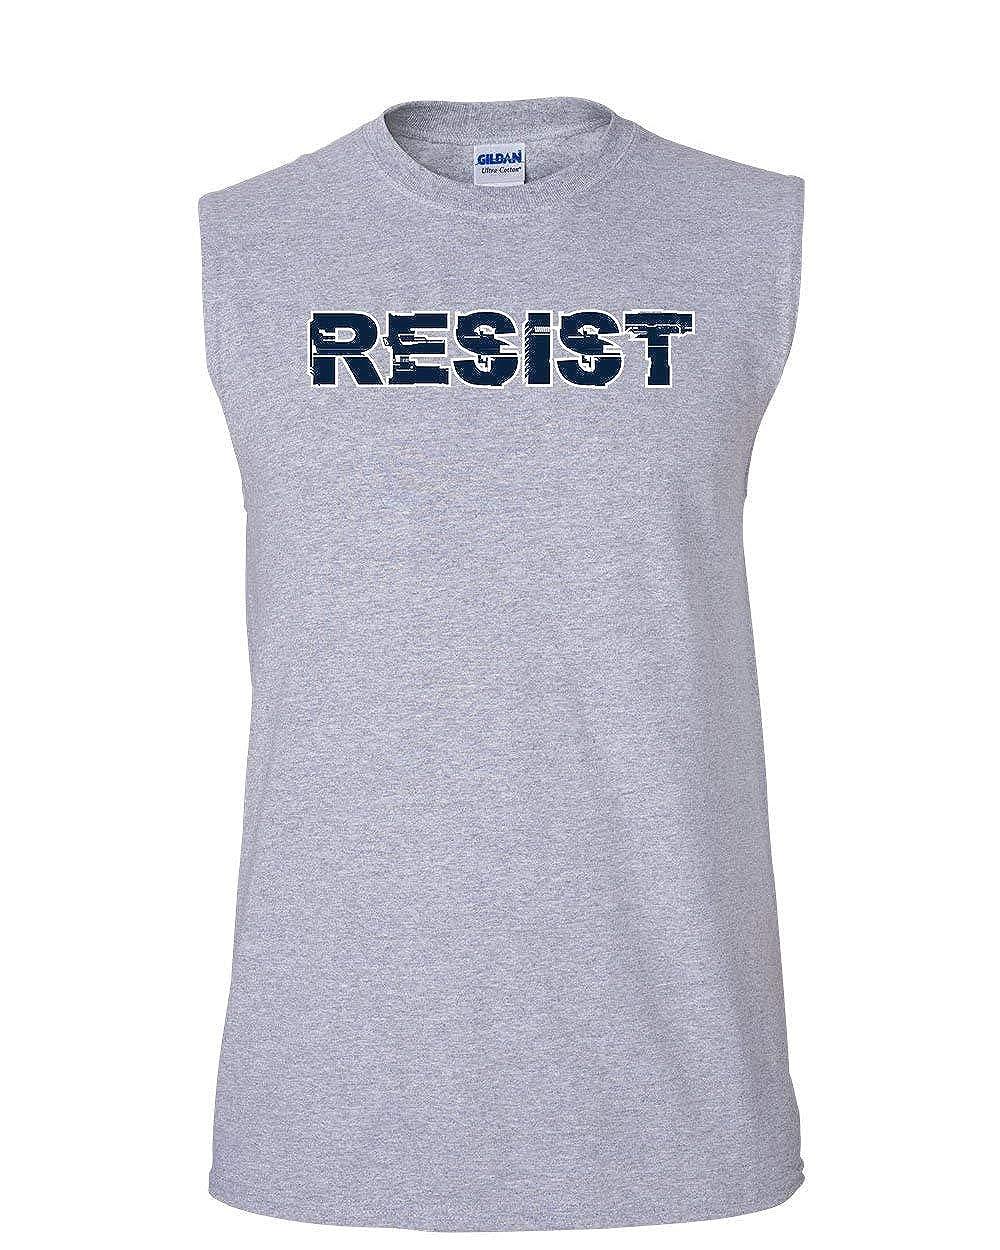 Resist Muscle Shirt Anti Trump Not My President Impeach 45 Patriotic Sleeveless